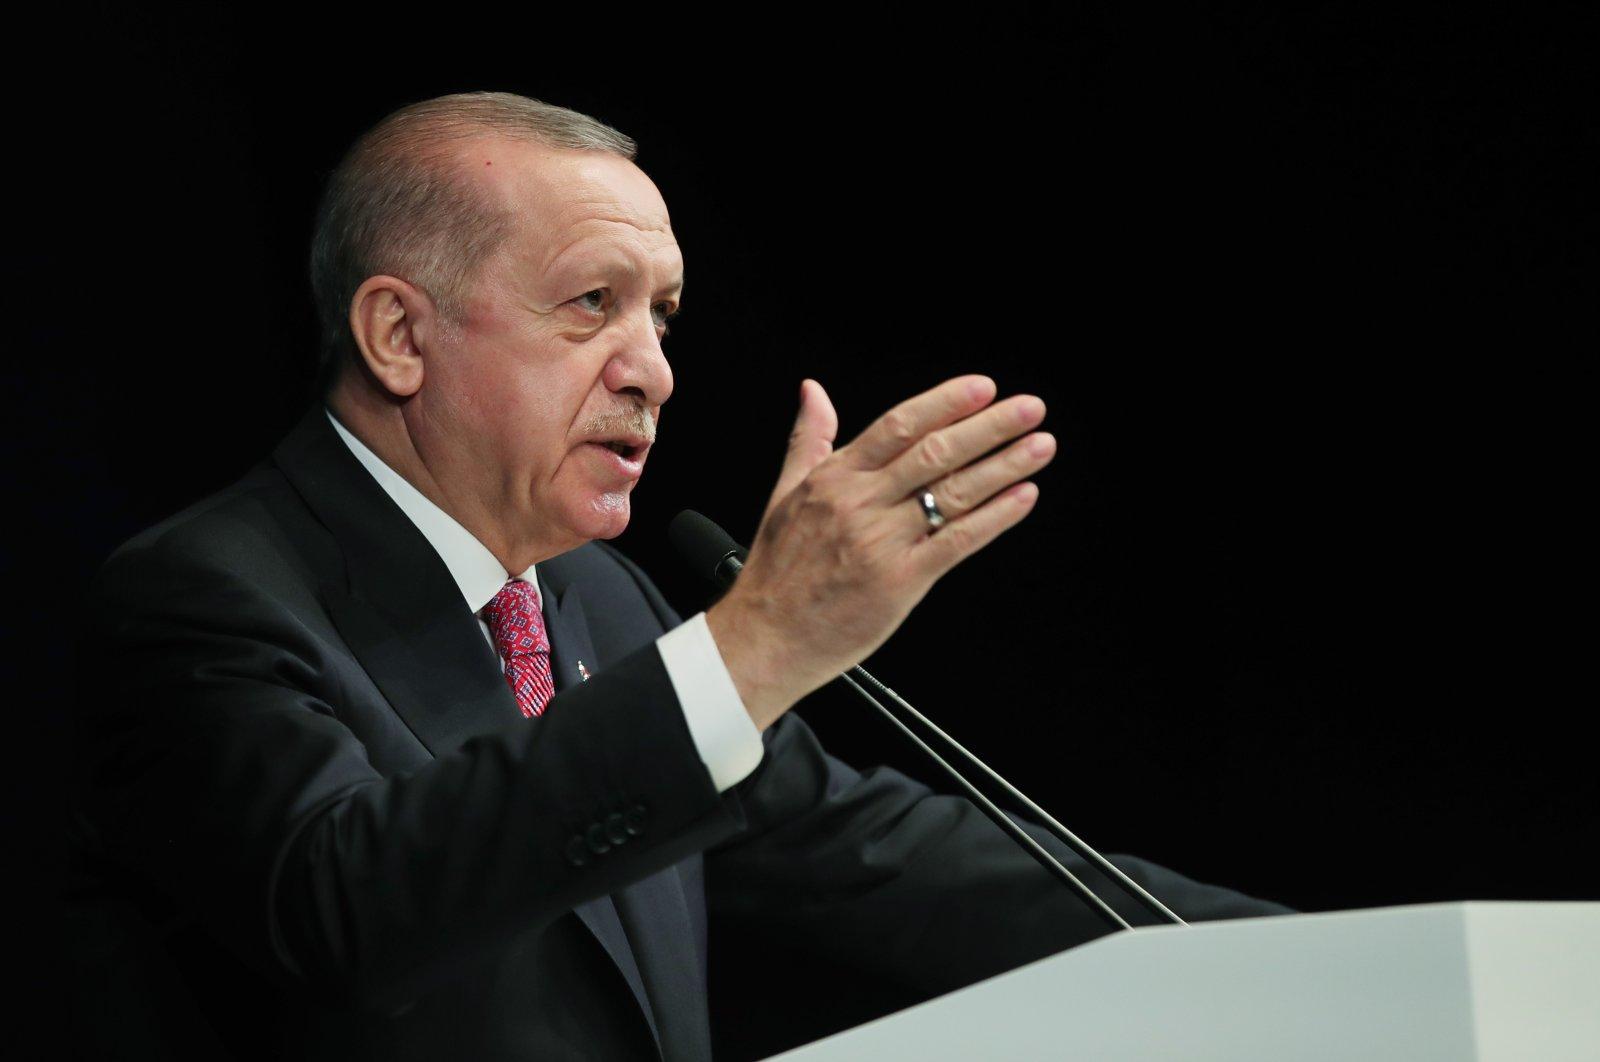 President Recep Tayyip Erdoğan speaks during the opening ceremony of the Atlas 1948 Theater in Beyoğlu, Istanbul, Turkey, Feb. 26, 2021. (AA File Photo)